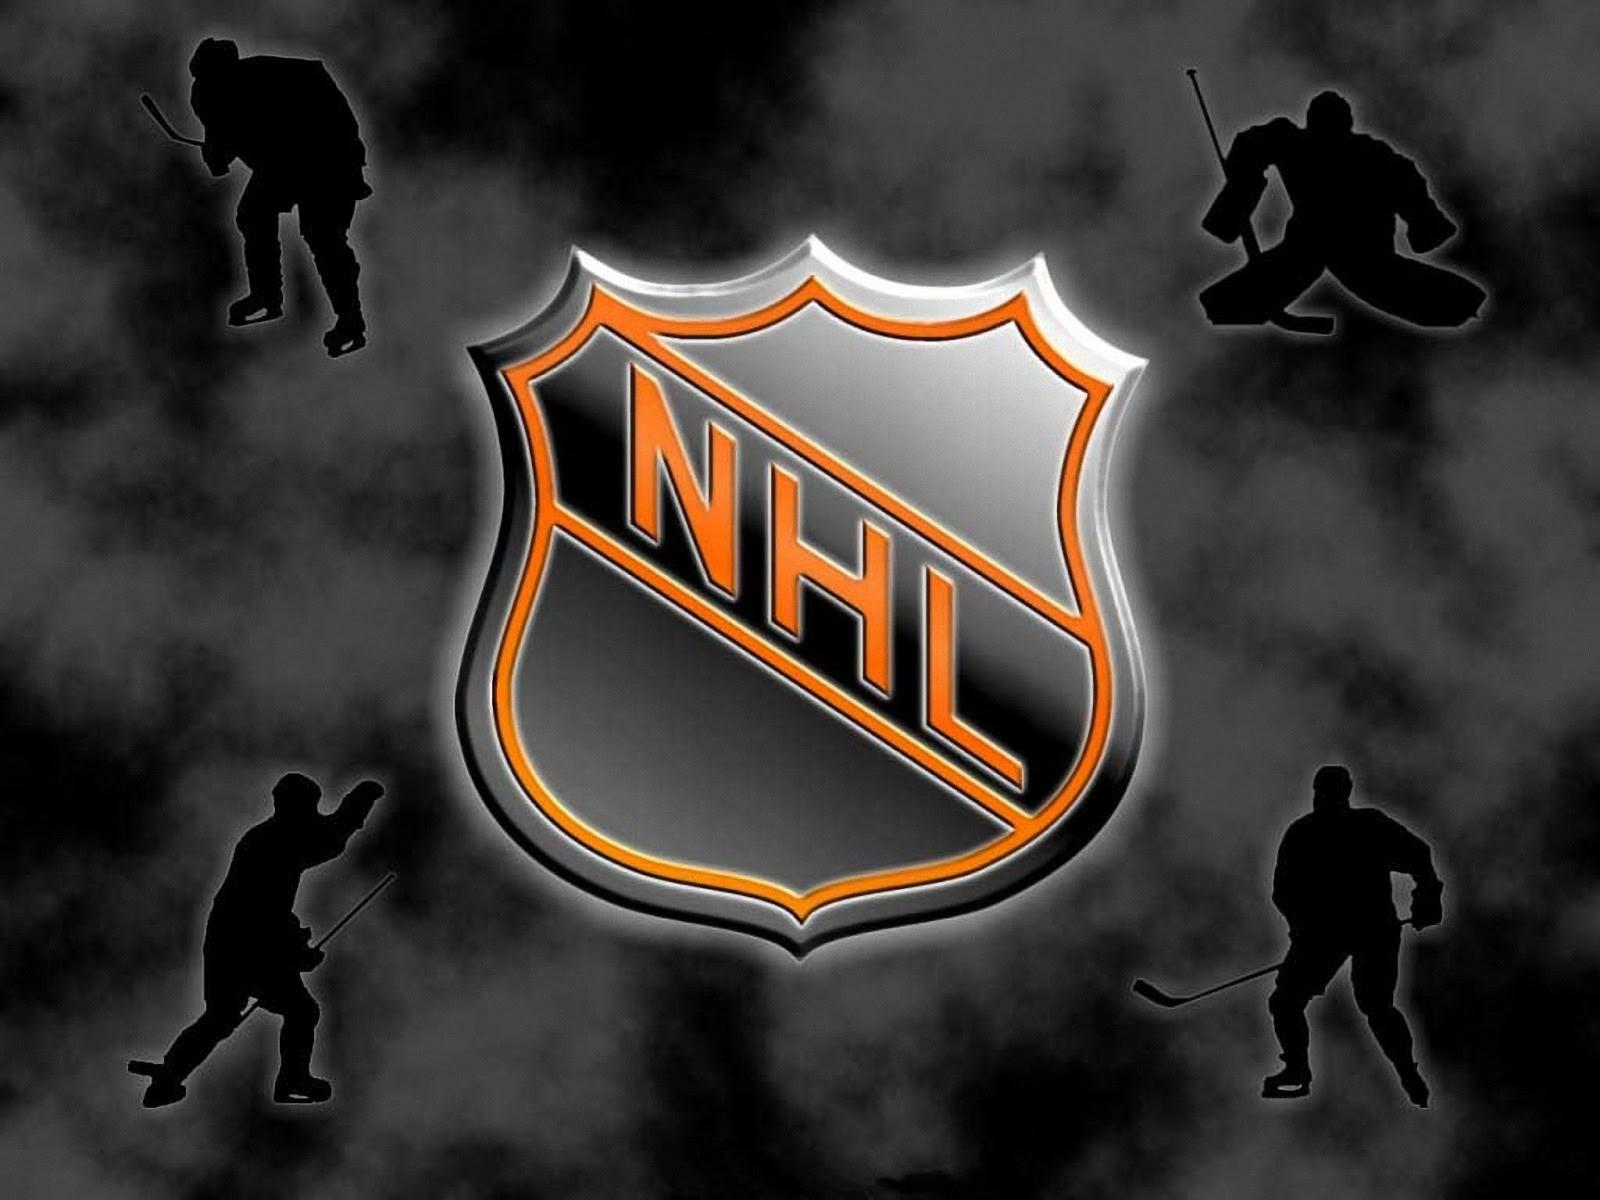 Resultado de imagen para nhl logo wallpaper